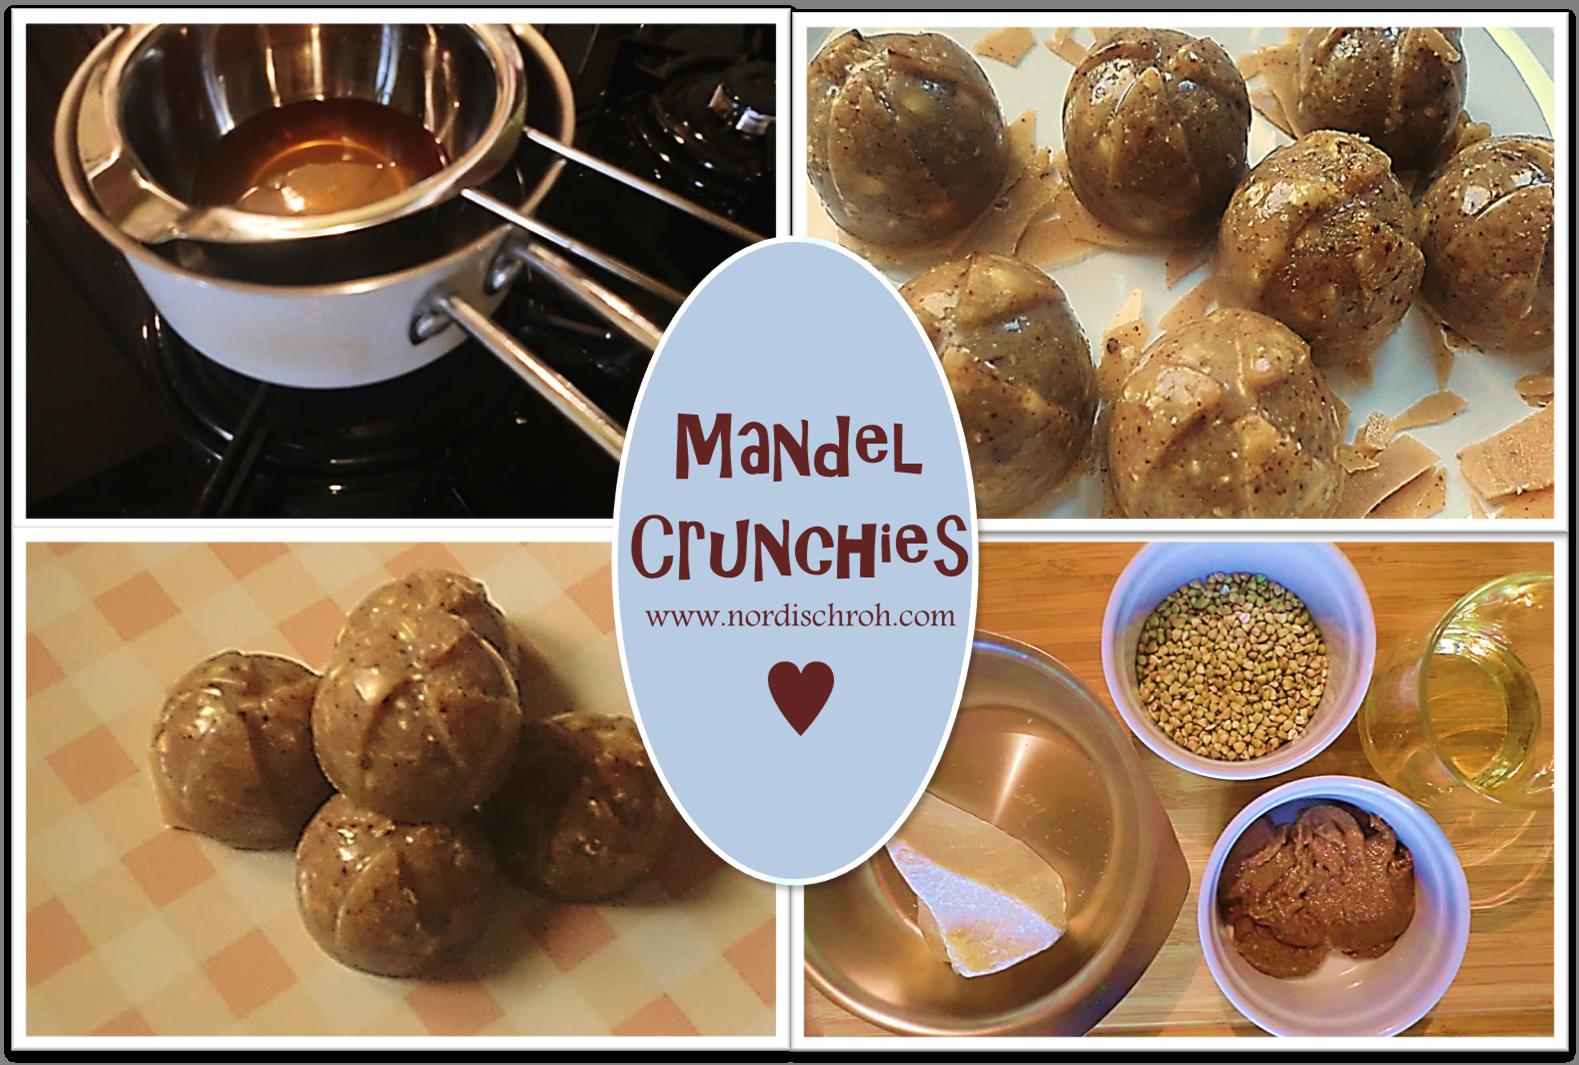 Mandel Crunchies